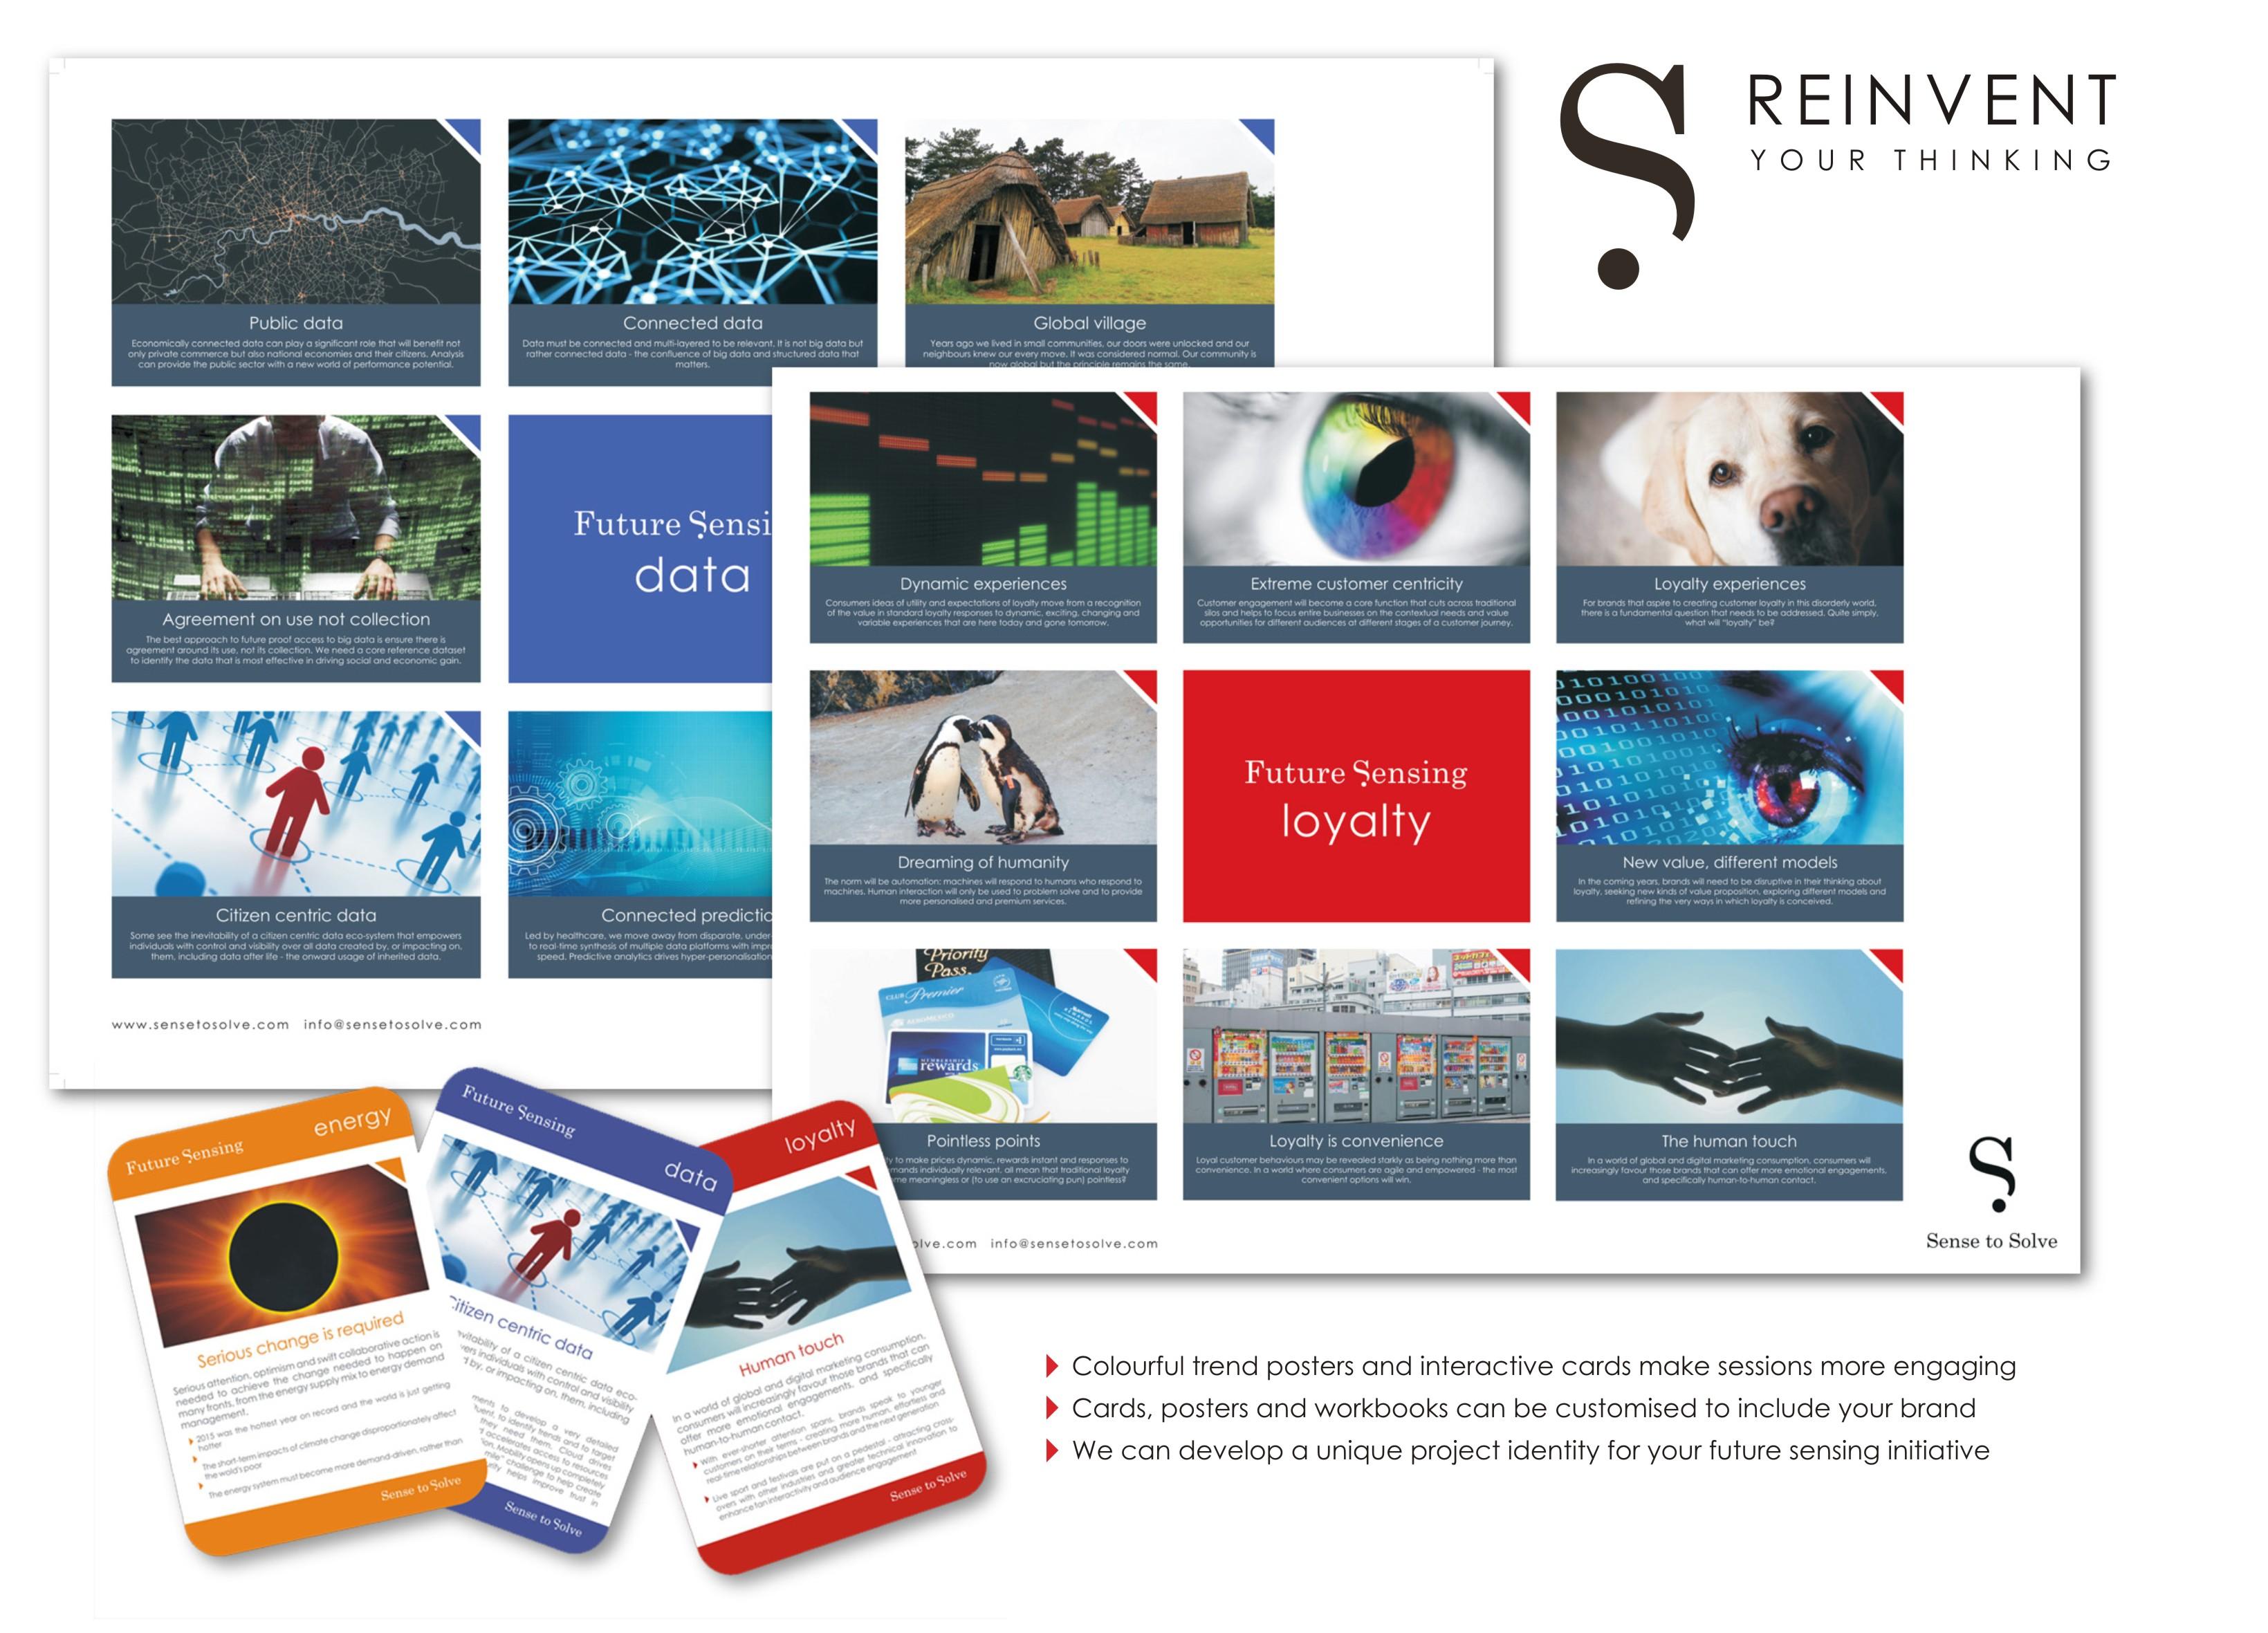 Sense To Solve - Future Sensing Tools